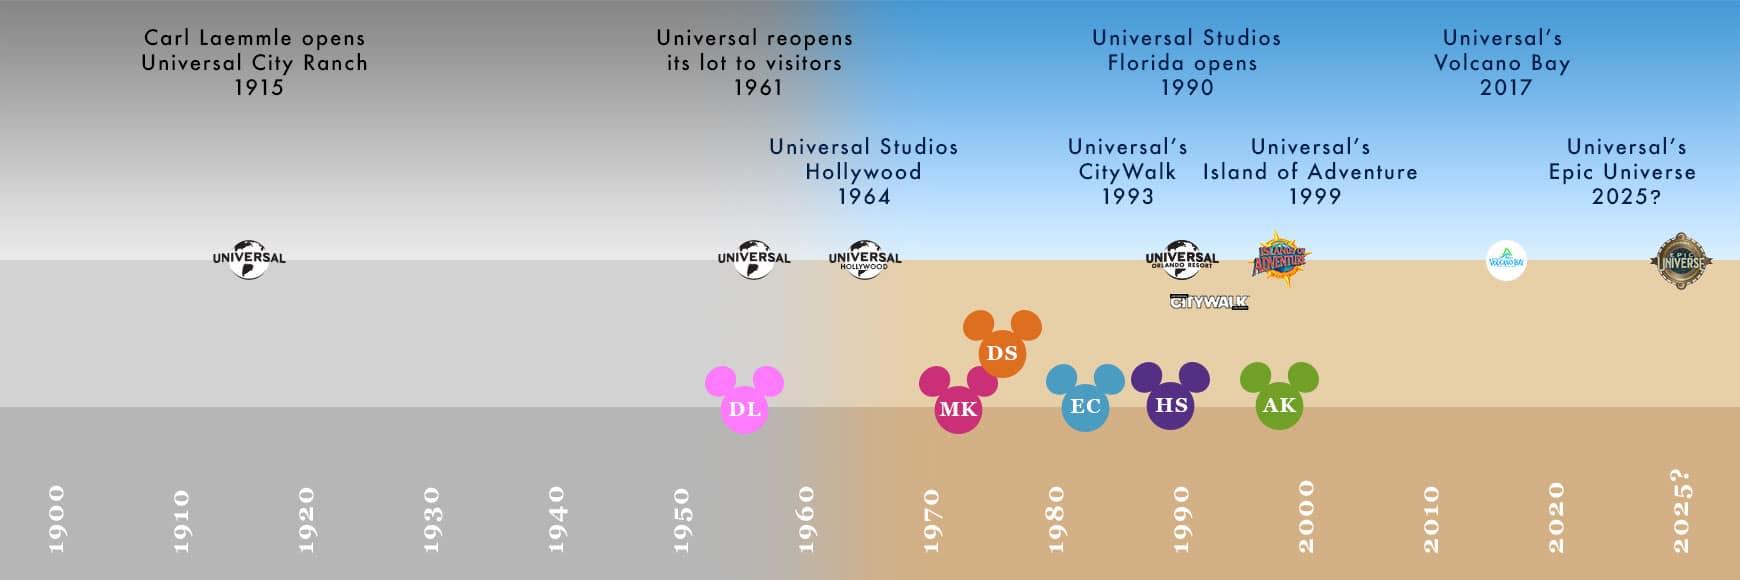 Universal Vs Disney Opening Dates